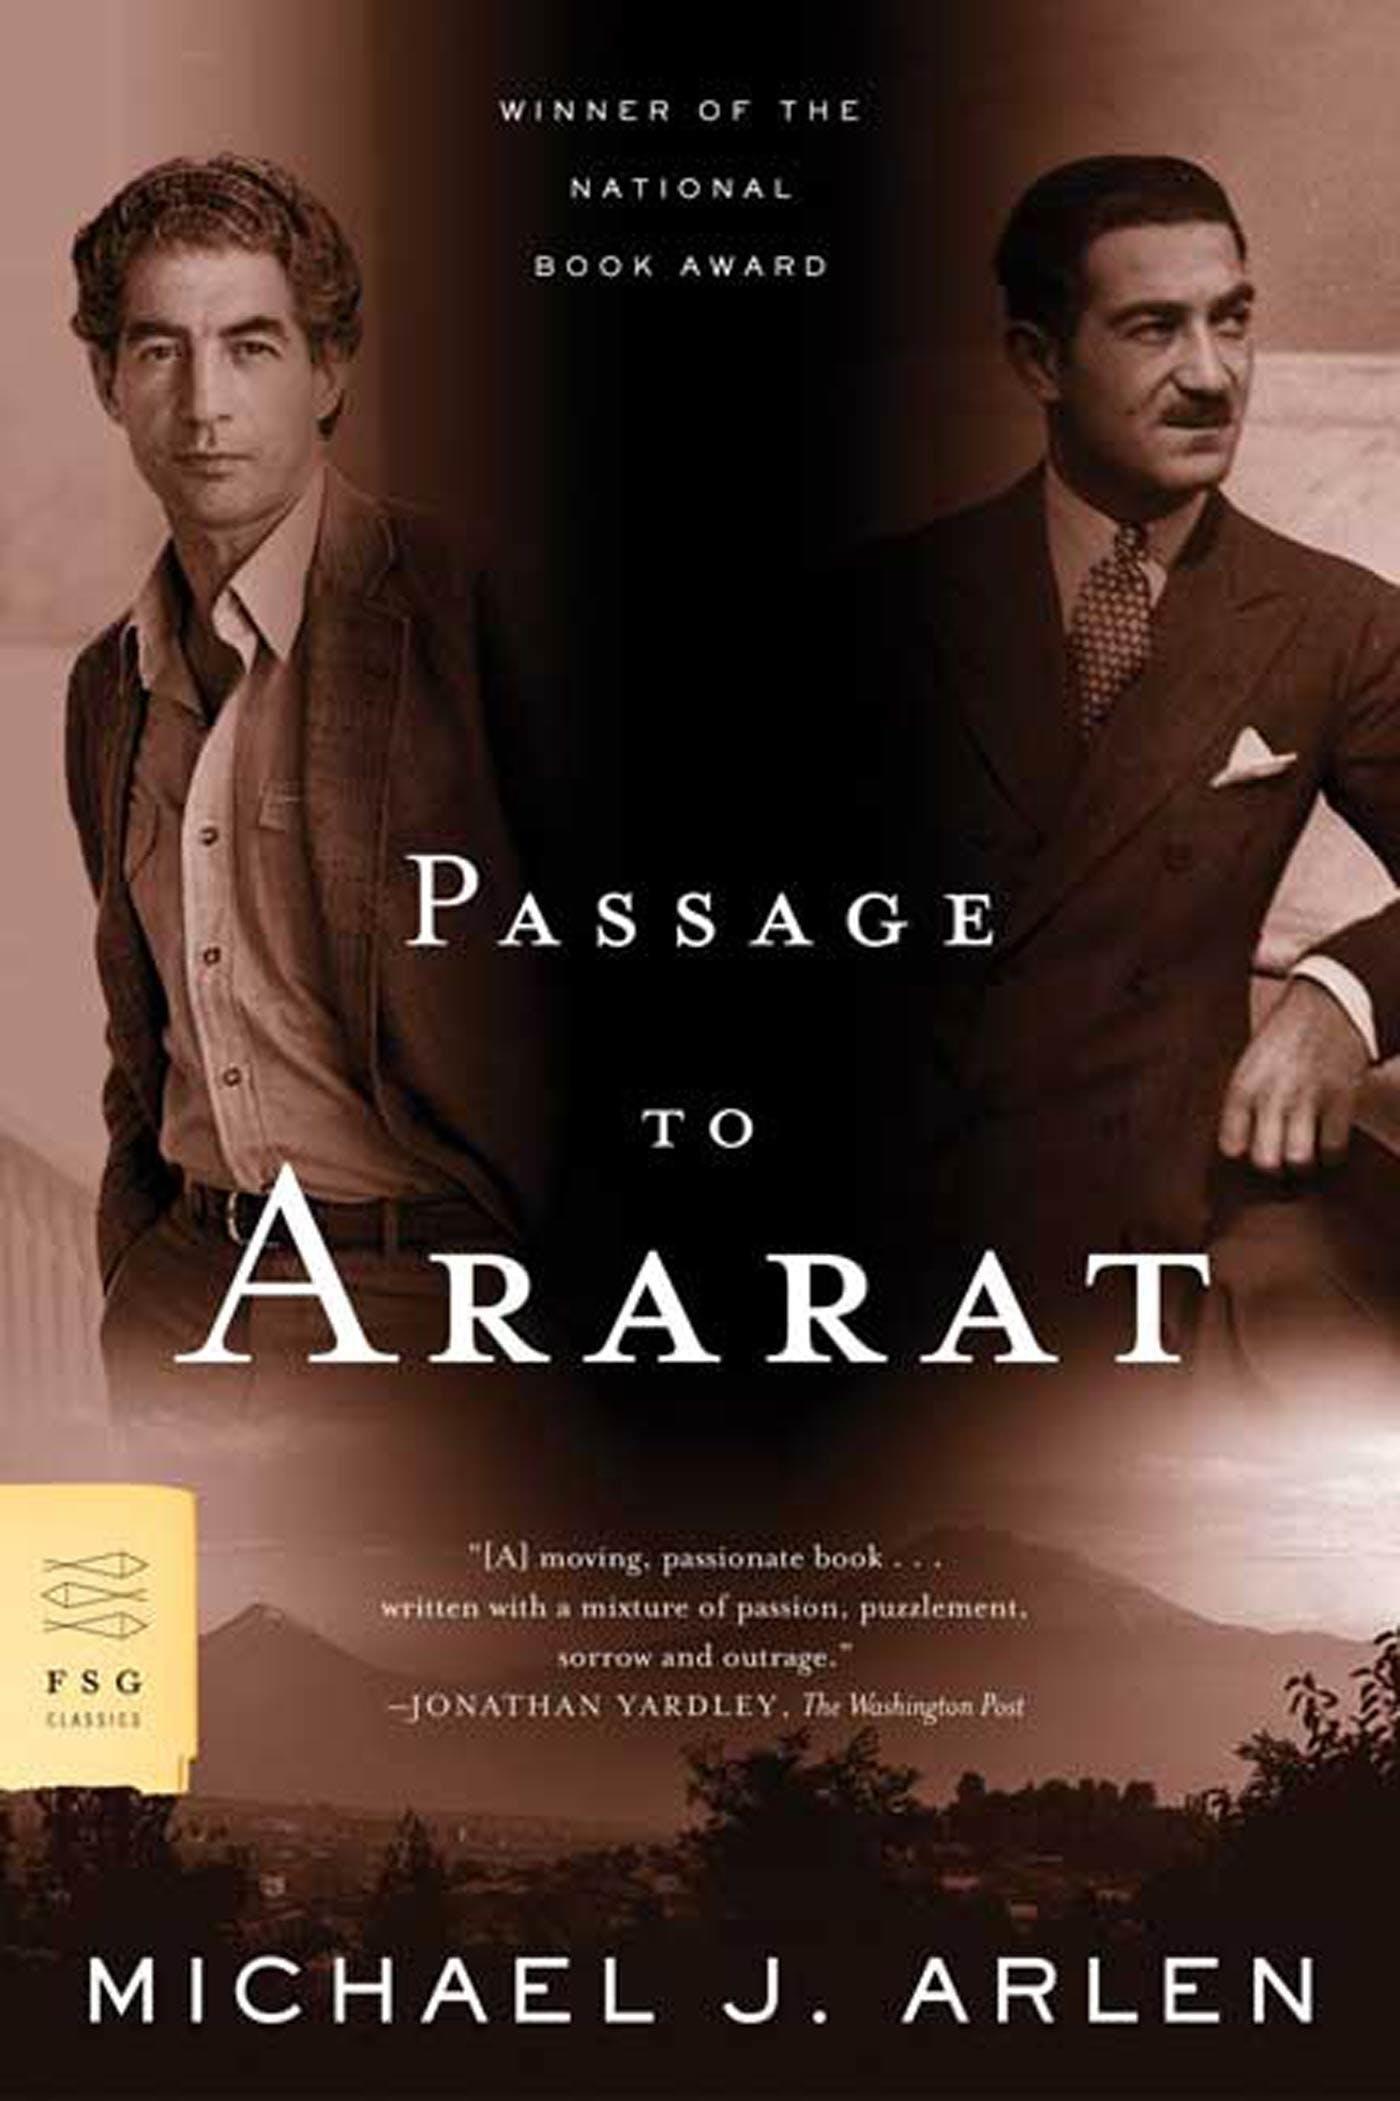 Image of Passage to Ararat